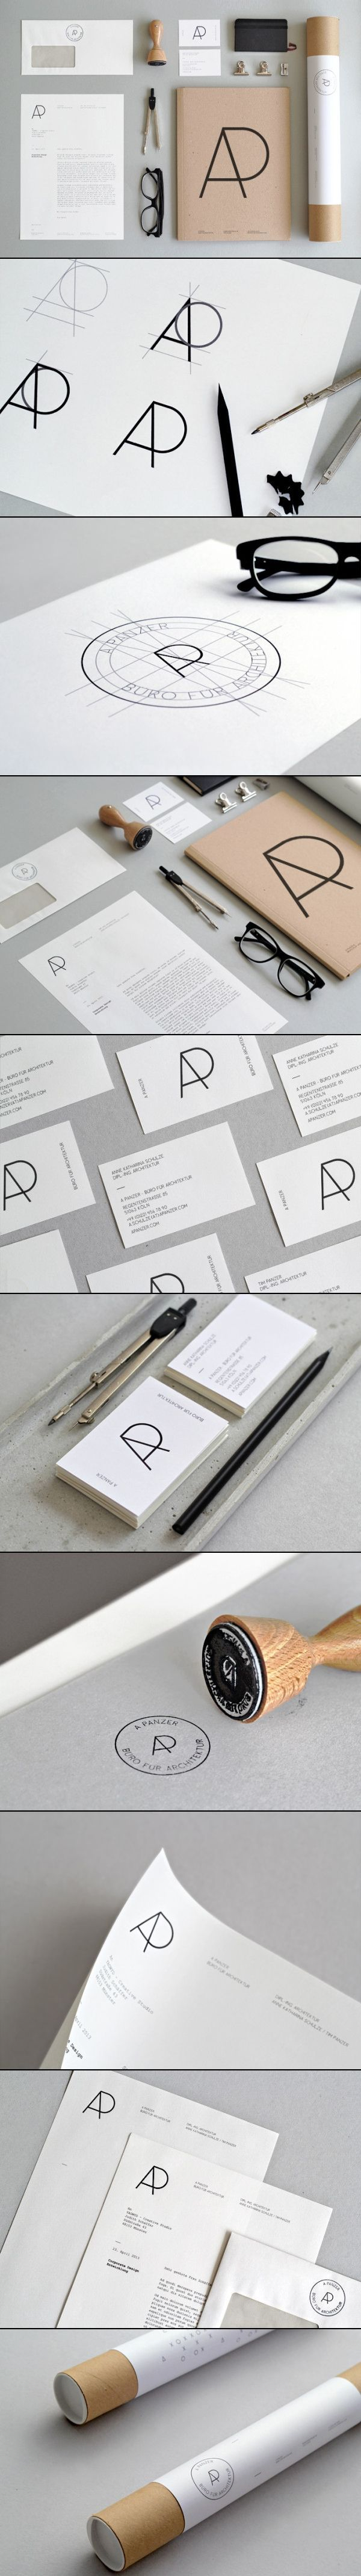 YAGWYD Branding - Creative Studio